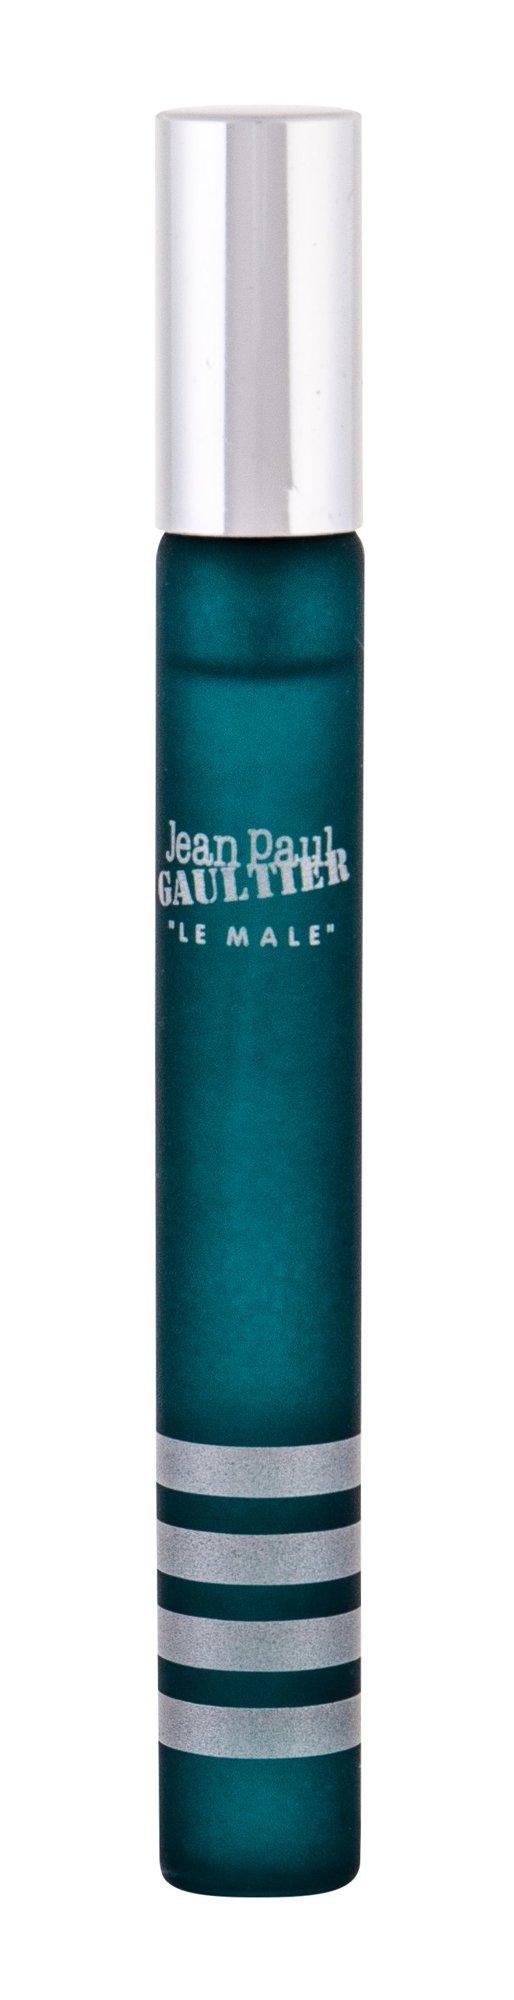 Jean Paul Gaultier Le Male, Toaletná voda 10ml